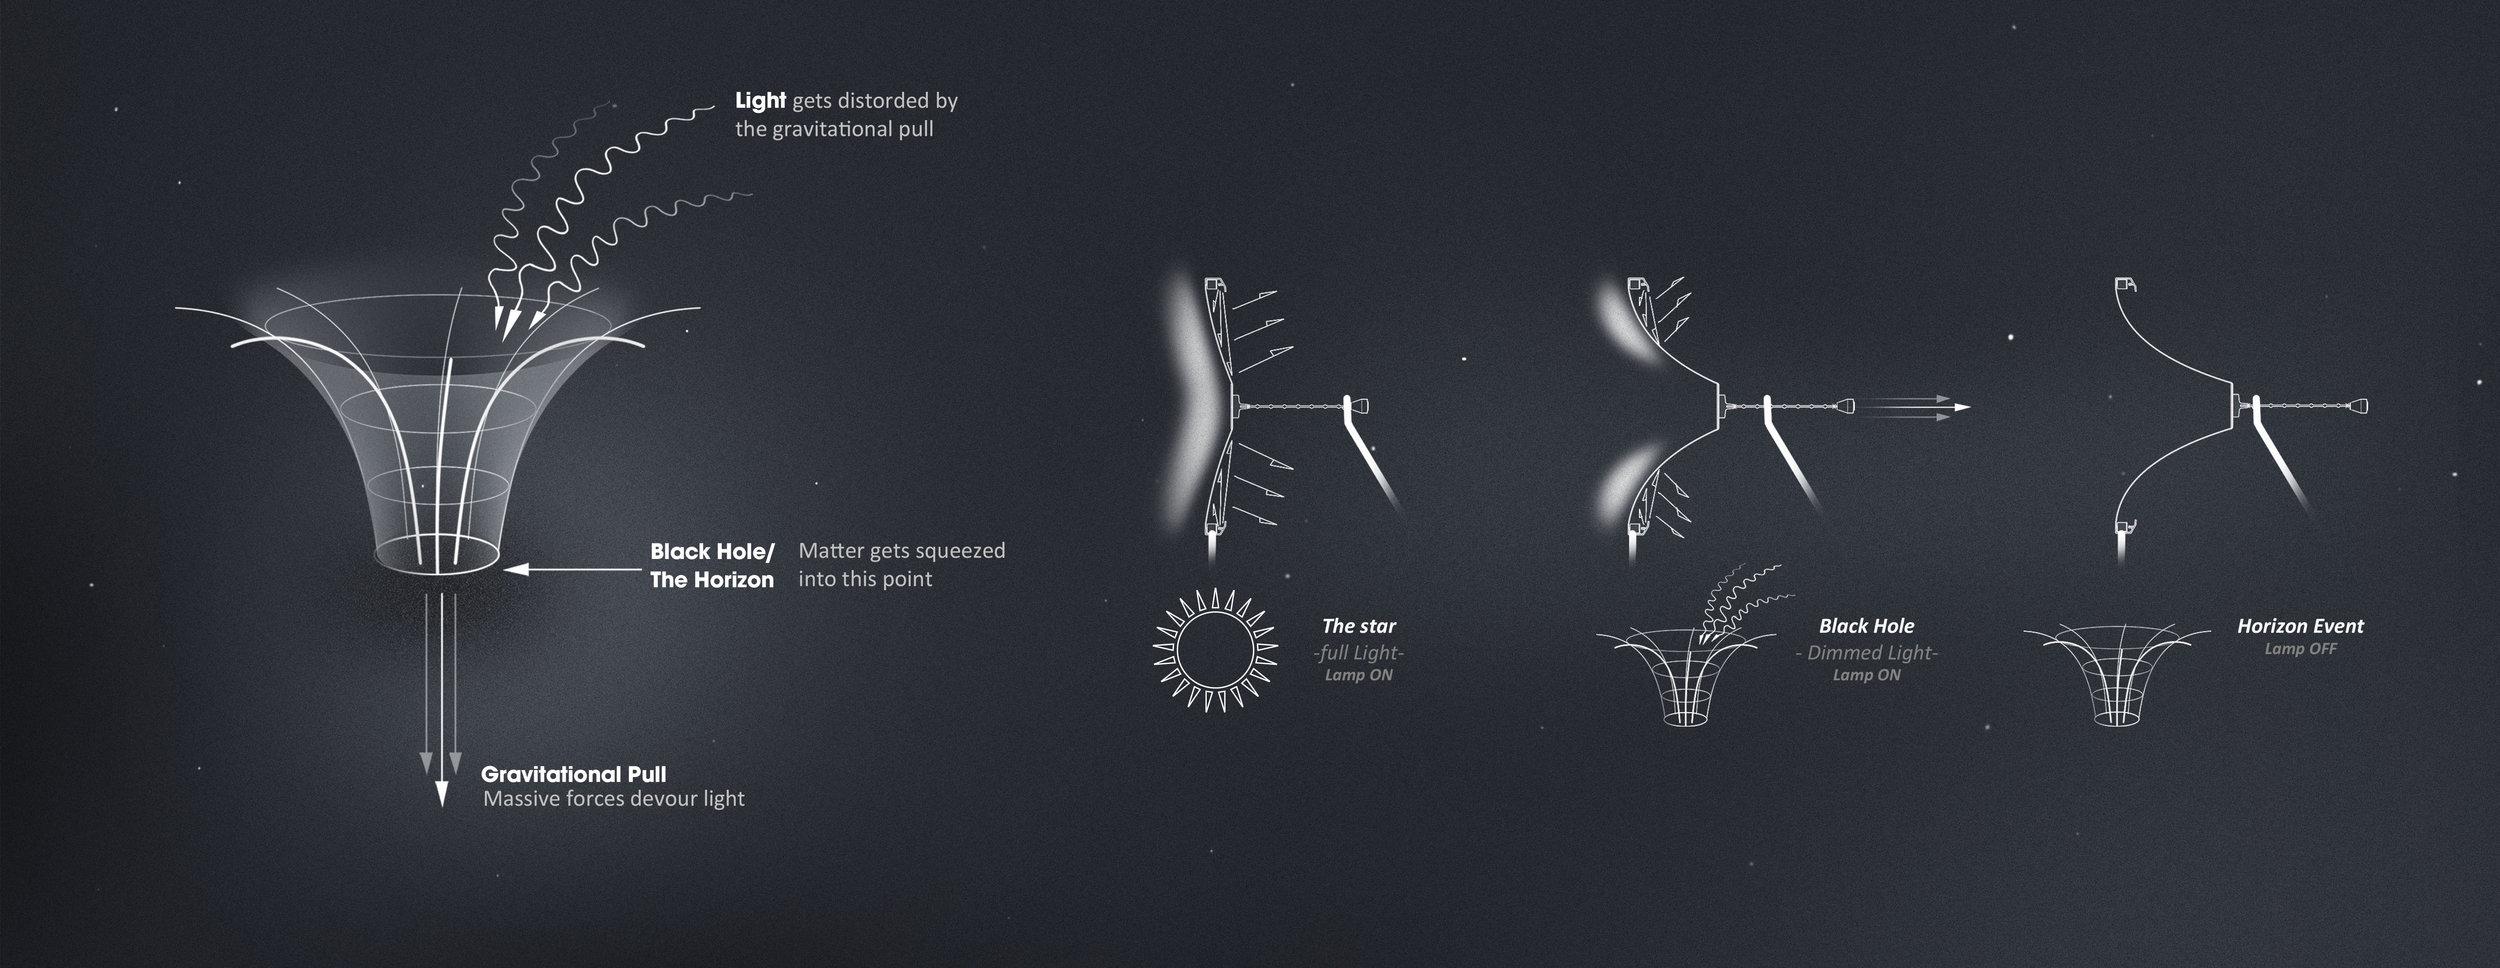 DarioNarvaez_Portfolio_Black_Hole_Lamp_Concept_Statement-Banner.jpg